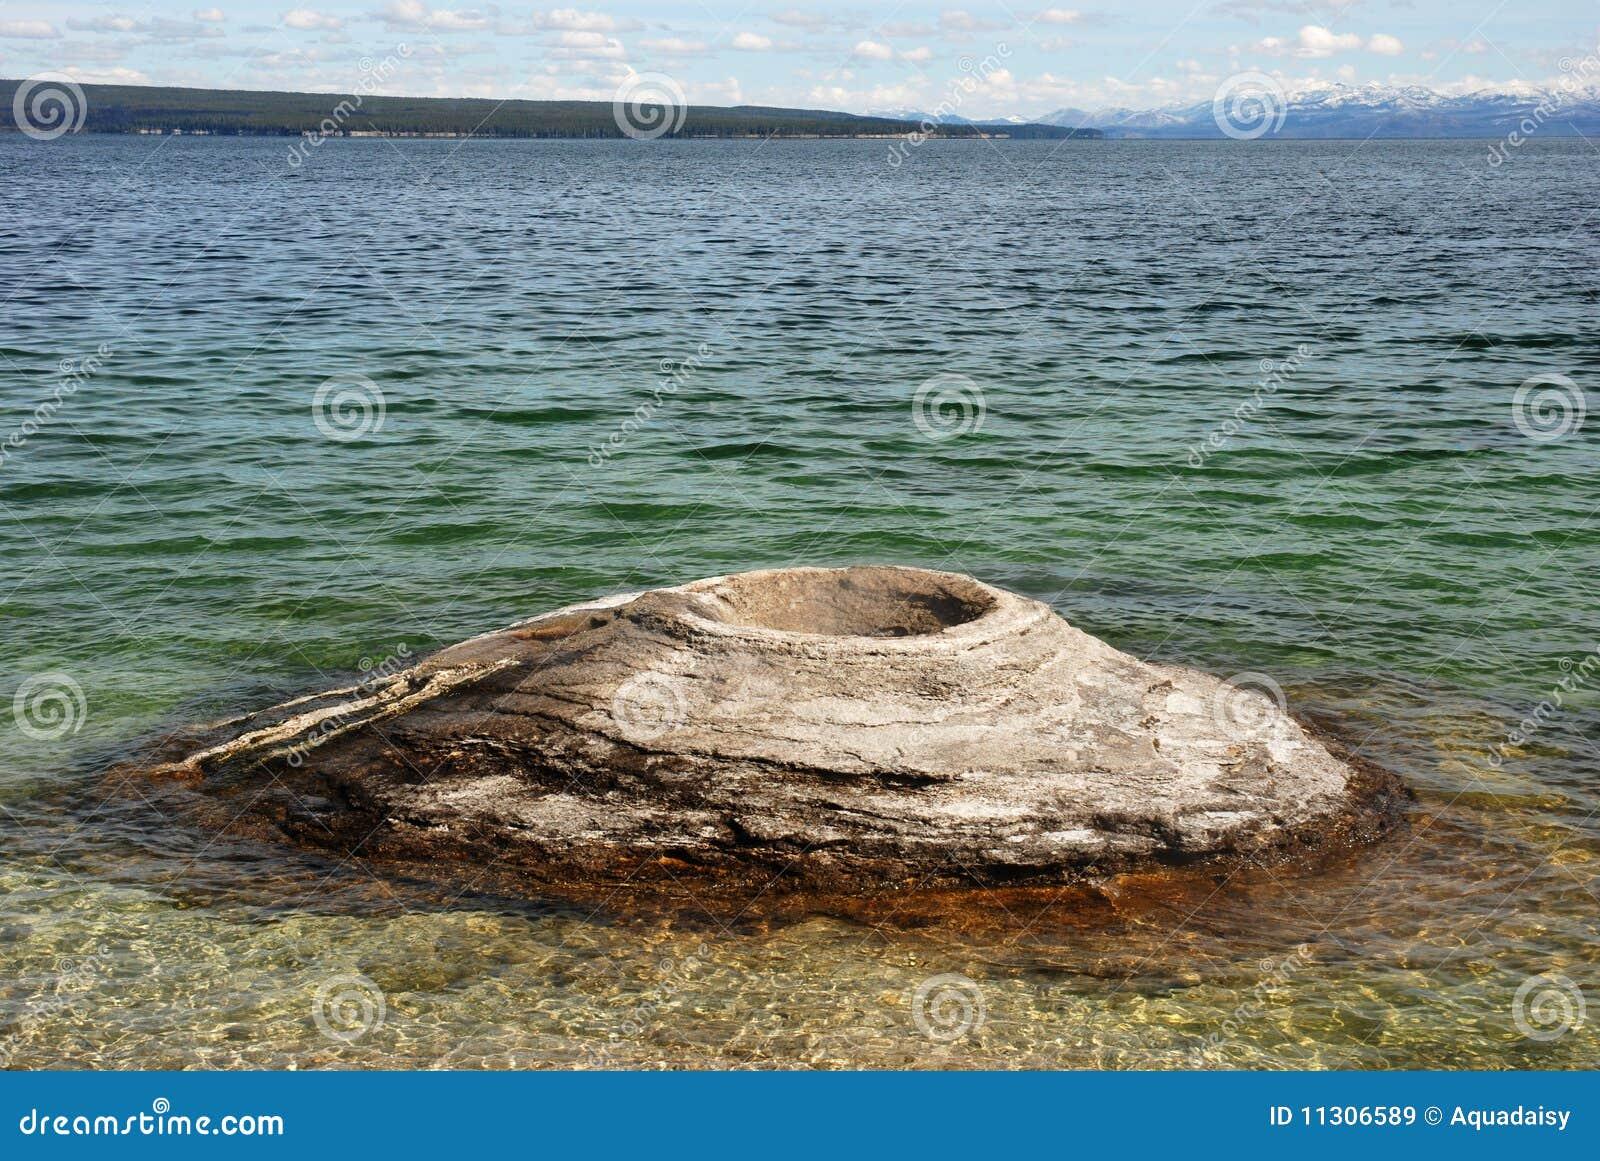 Großer Kegel-Geysir